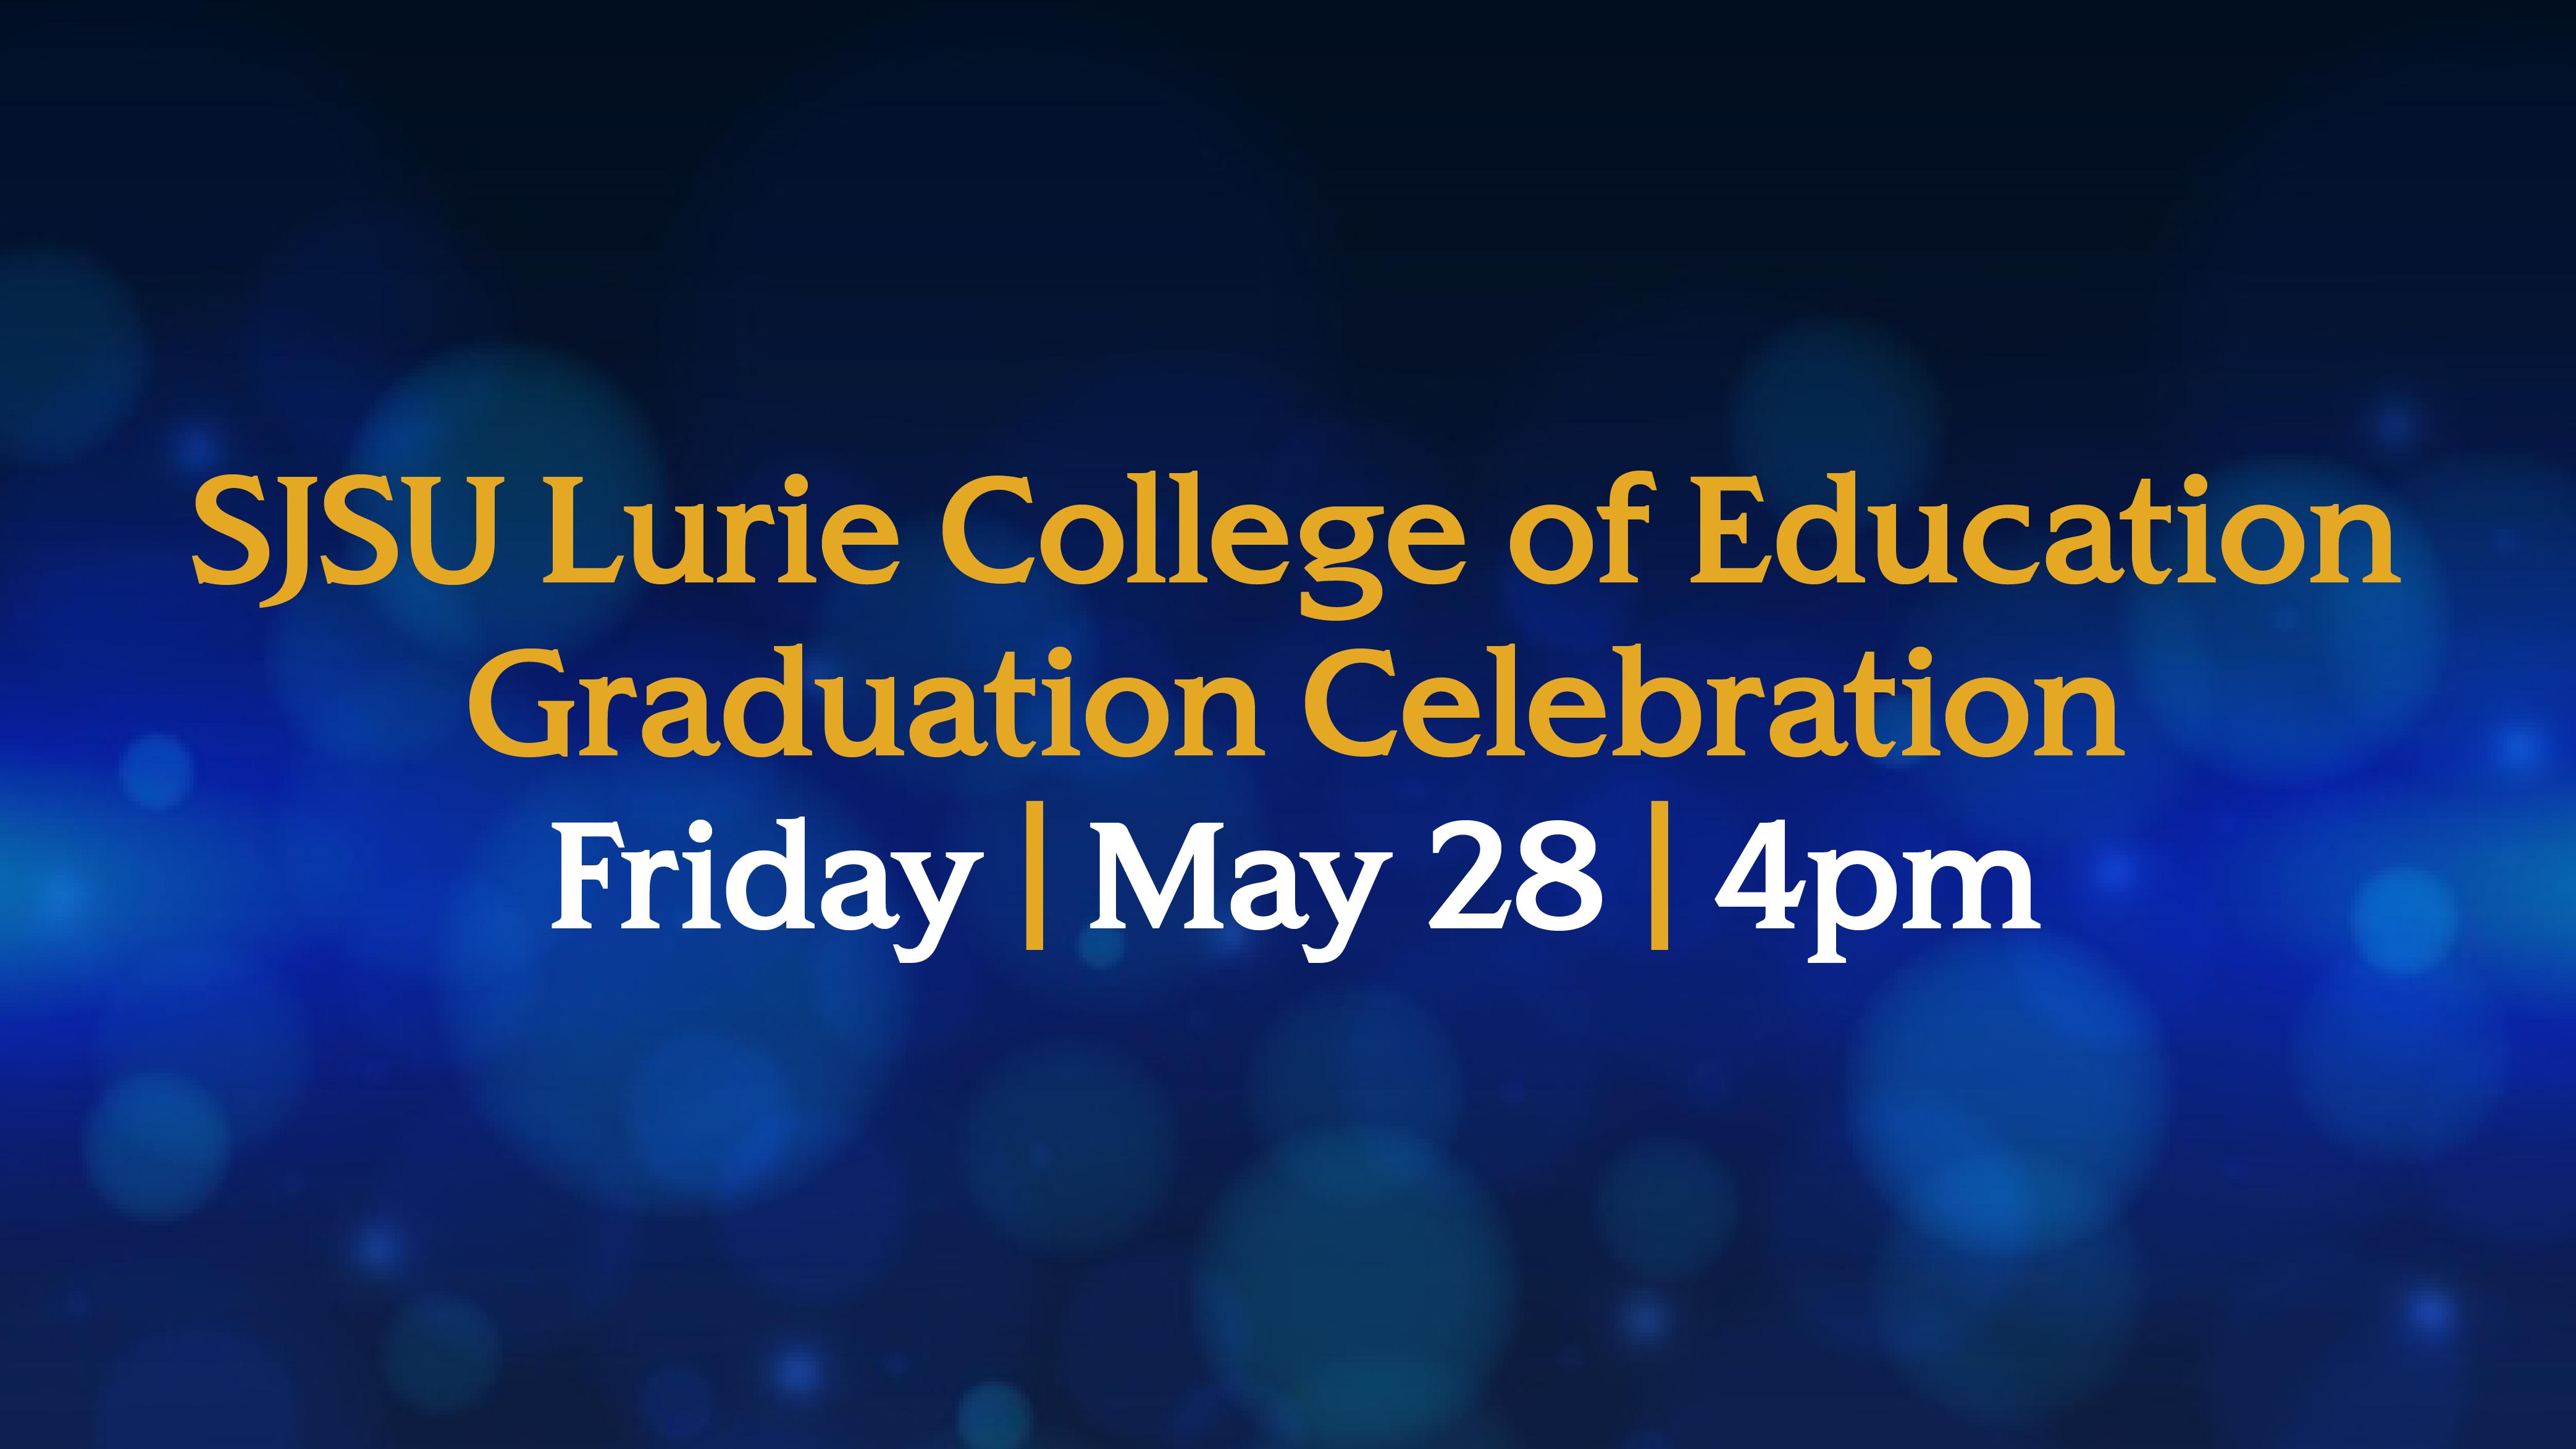 Sjsu Spring 2022 Academic Calendar.Graduation Commencement Connie L Lurie College Of Education